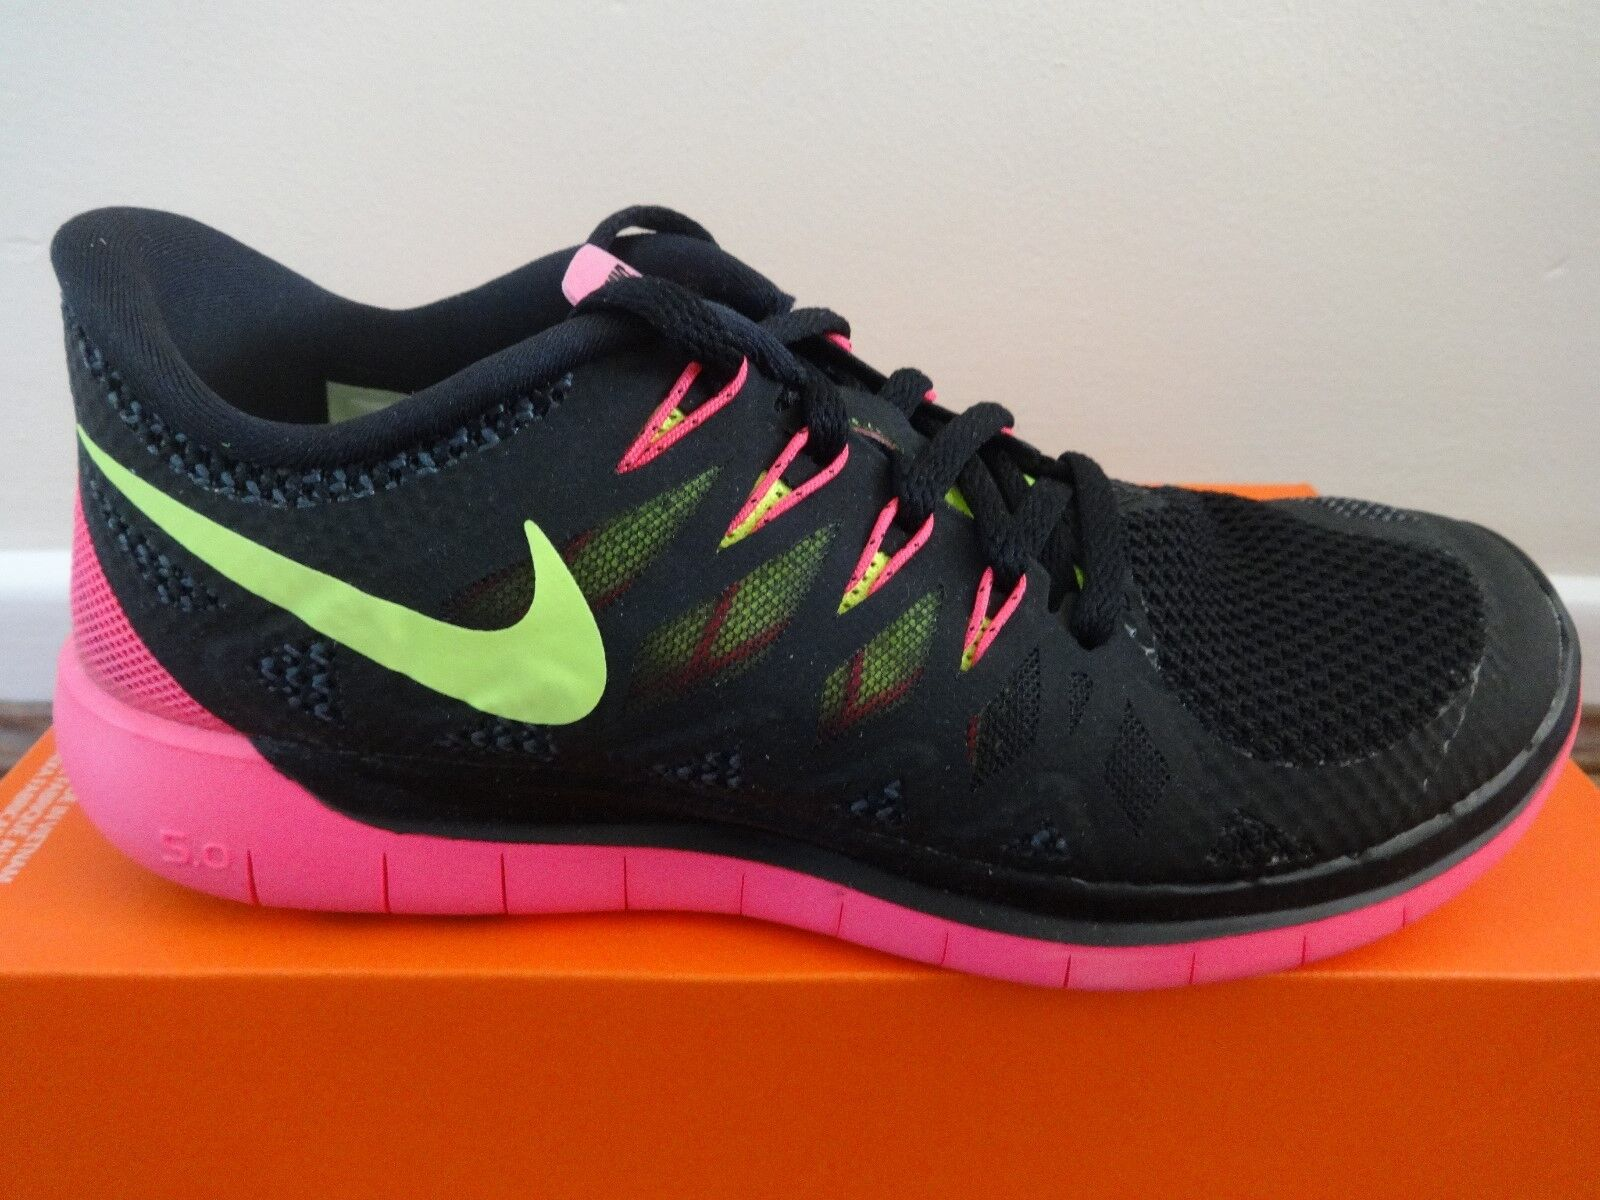 Nike Free shoes 5.0 womens trainers sneakers shoes Free 642199 002 uk 4.5 eu 38 us 7 NEW e8f58e